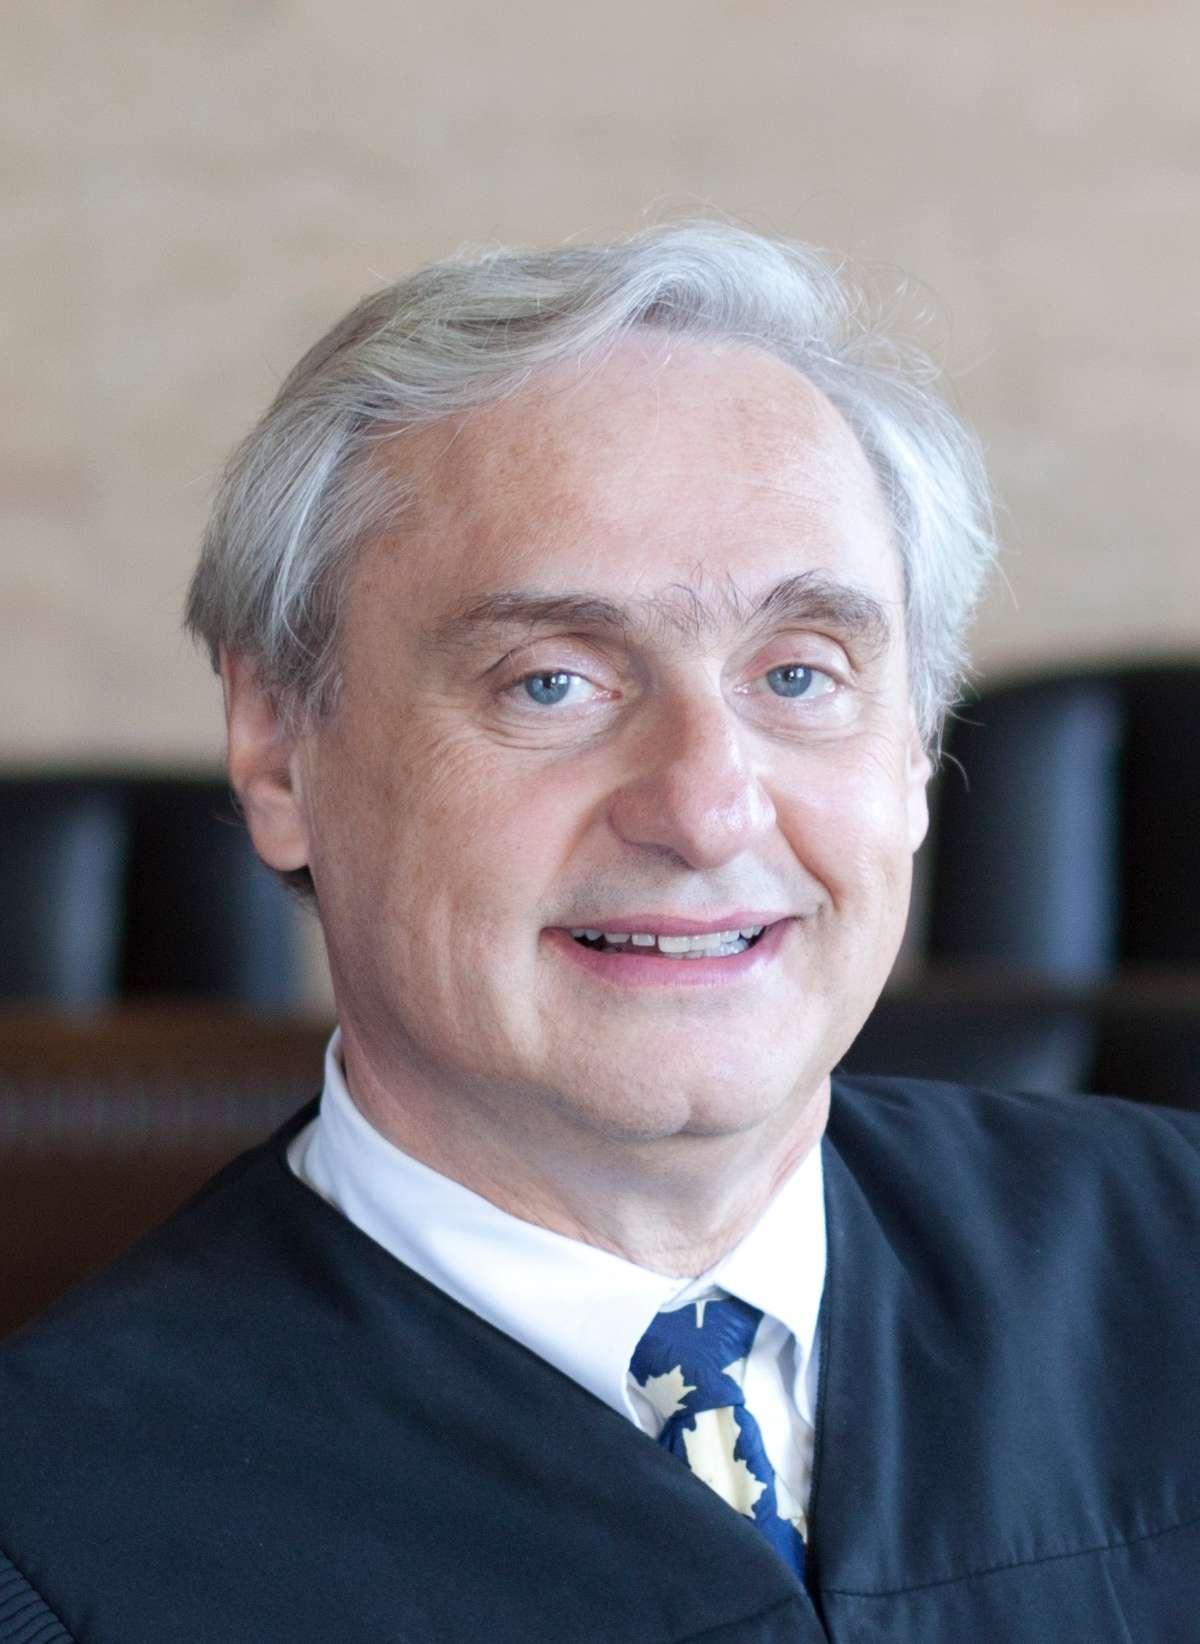 Judge Alex Kozinski, U.S. Court of Appeals for the Ninth Circuit (official photo).